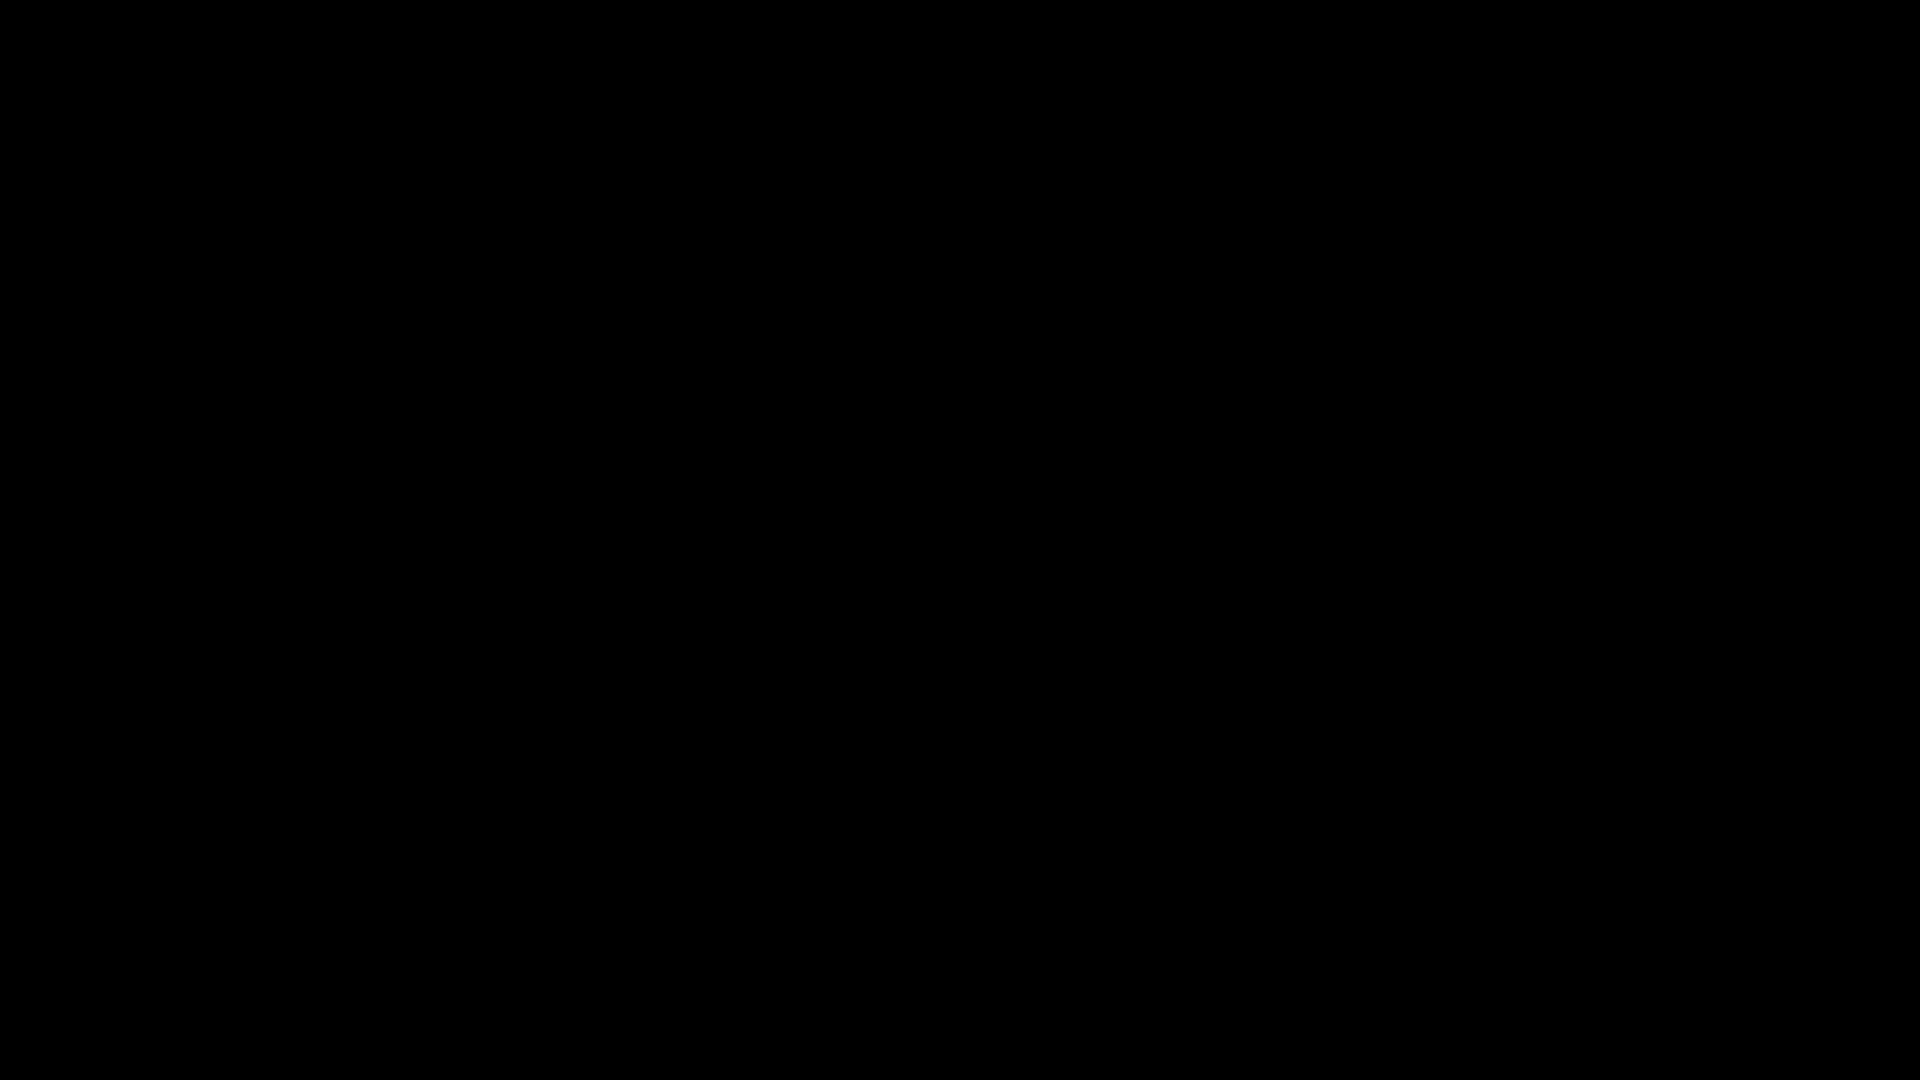 Mist Visual - Studio Animacji. Ósma ilustracja do animacji NASK Domeny